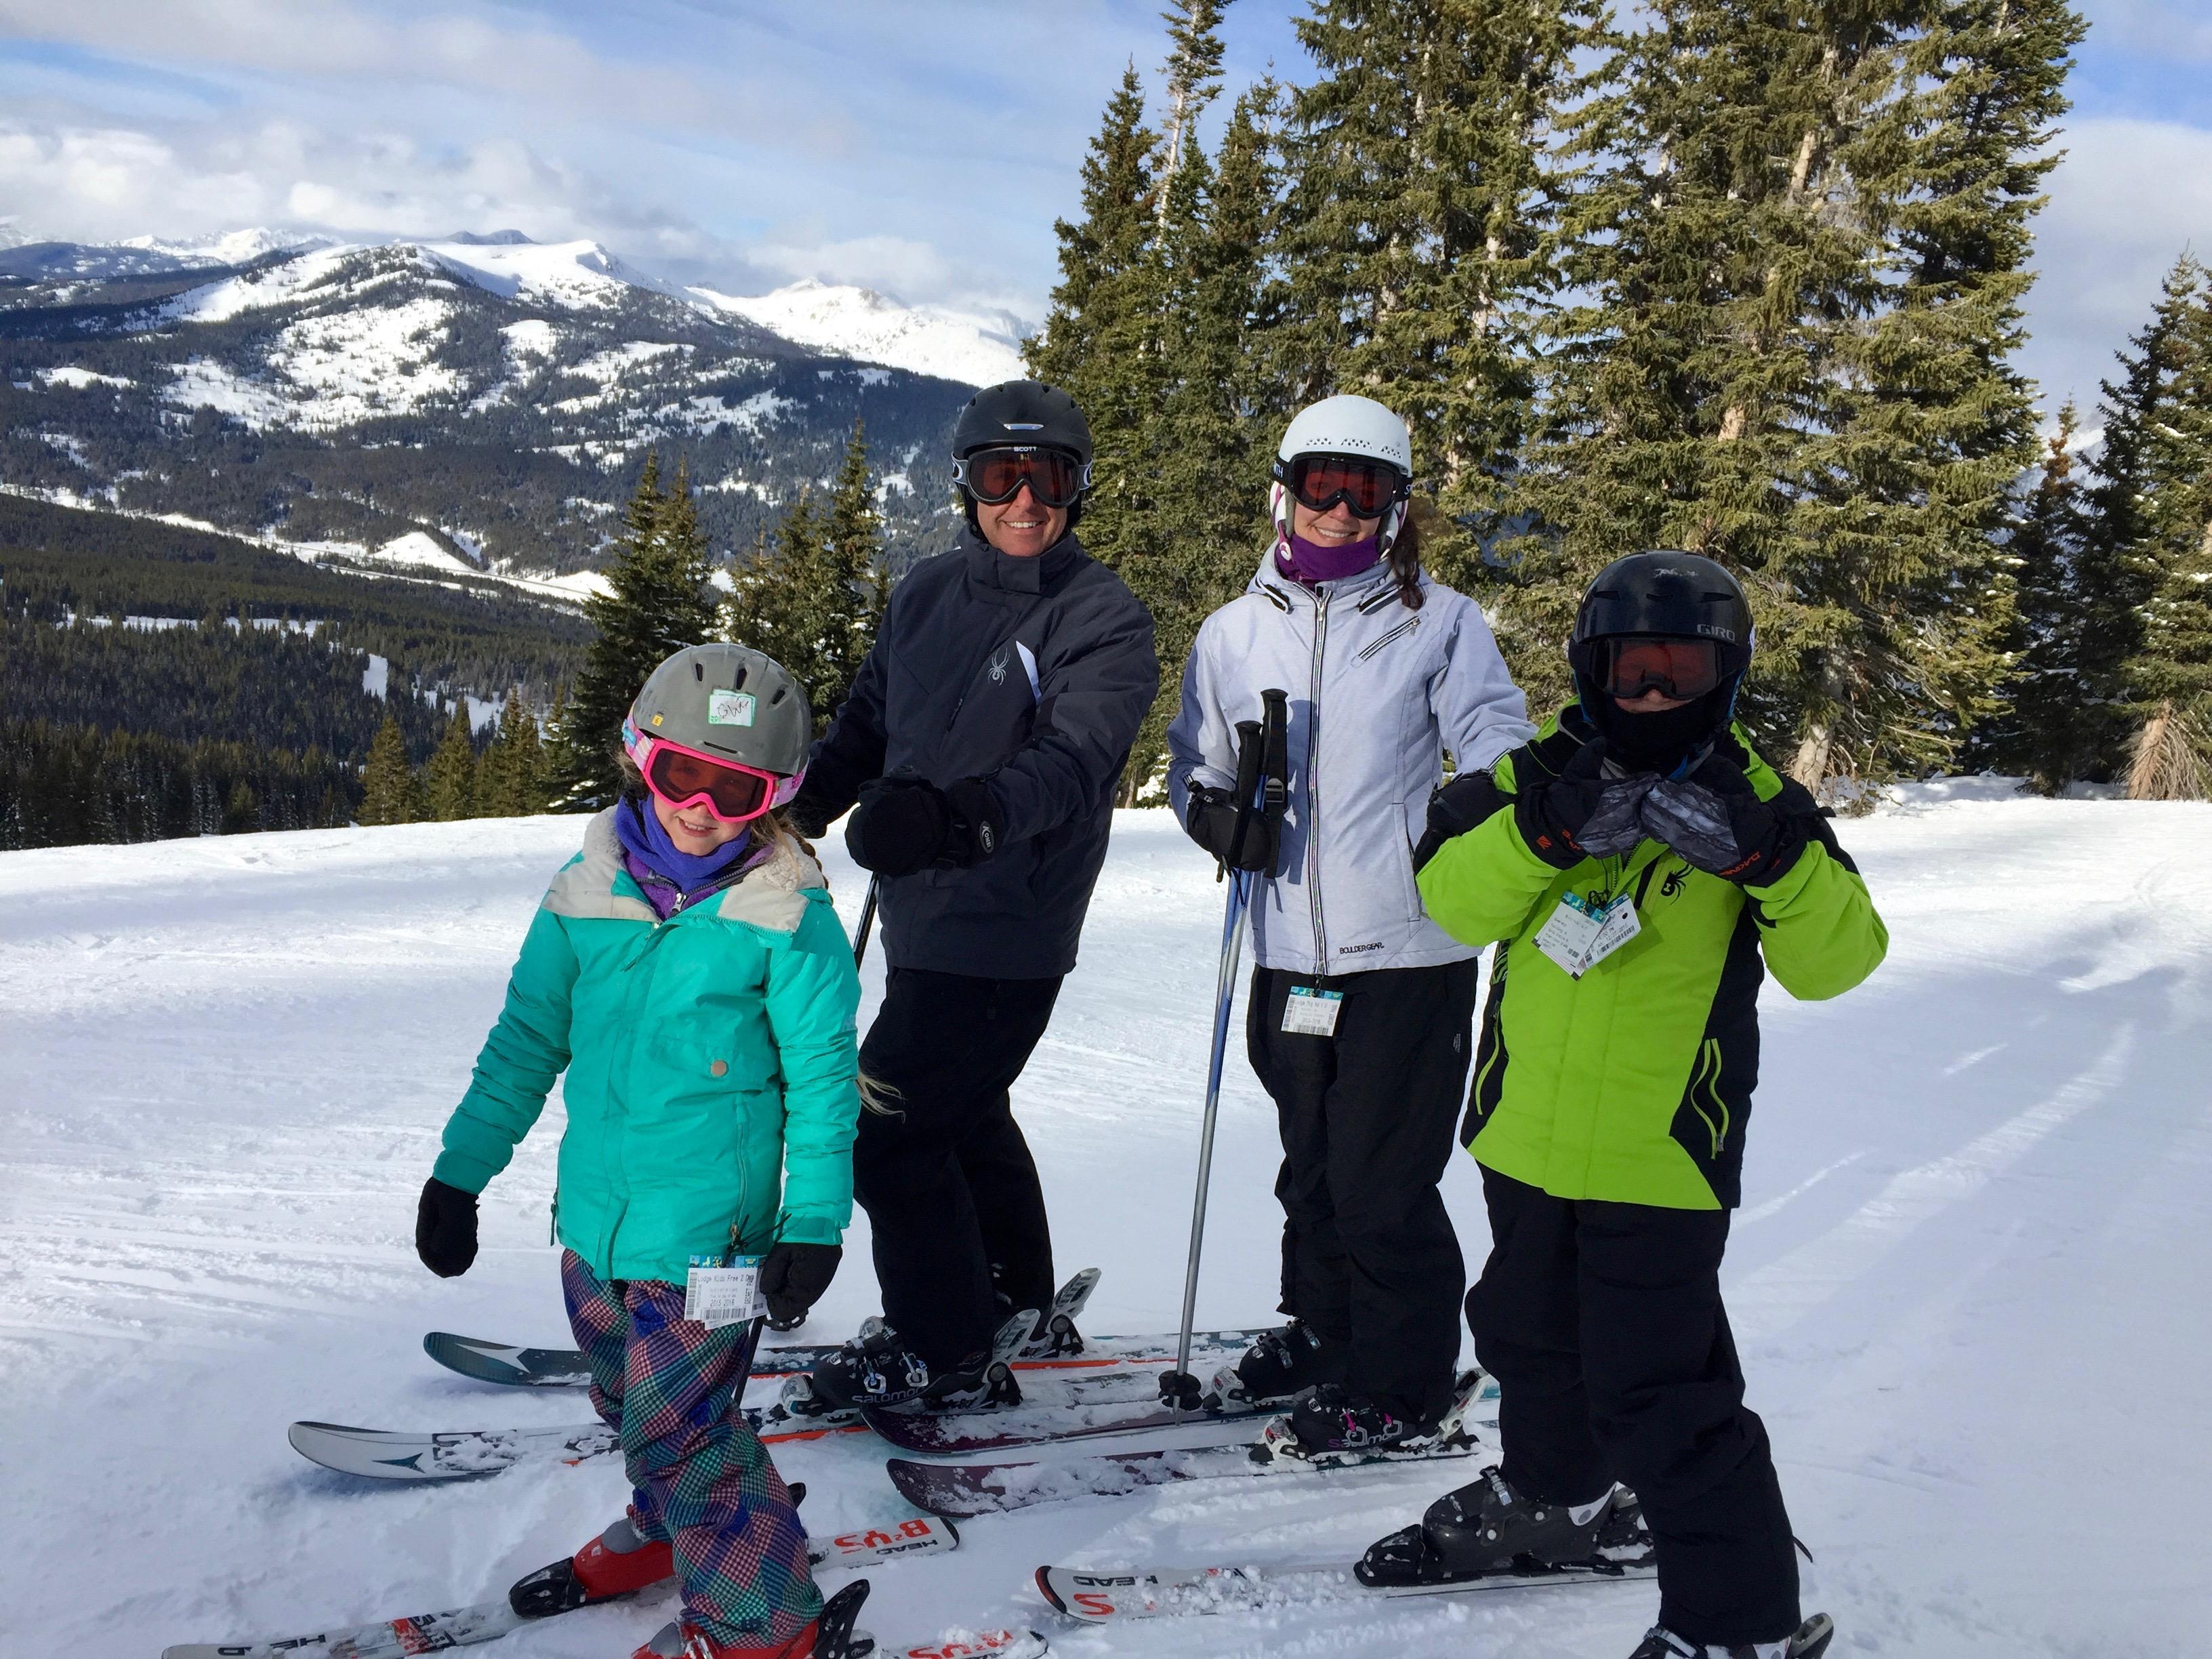 Family Ski, Family Travel, Family vacation, ski vacation, Copper Mountain